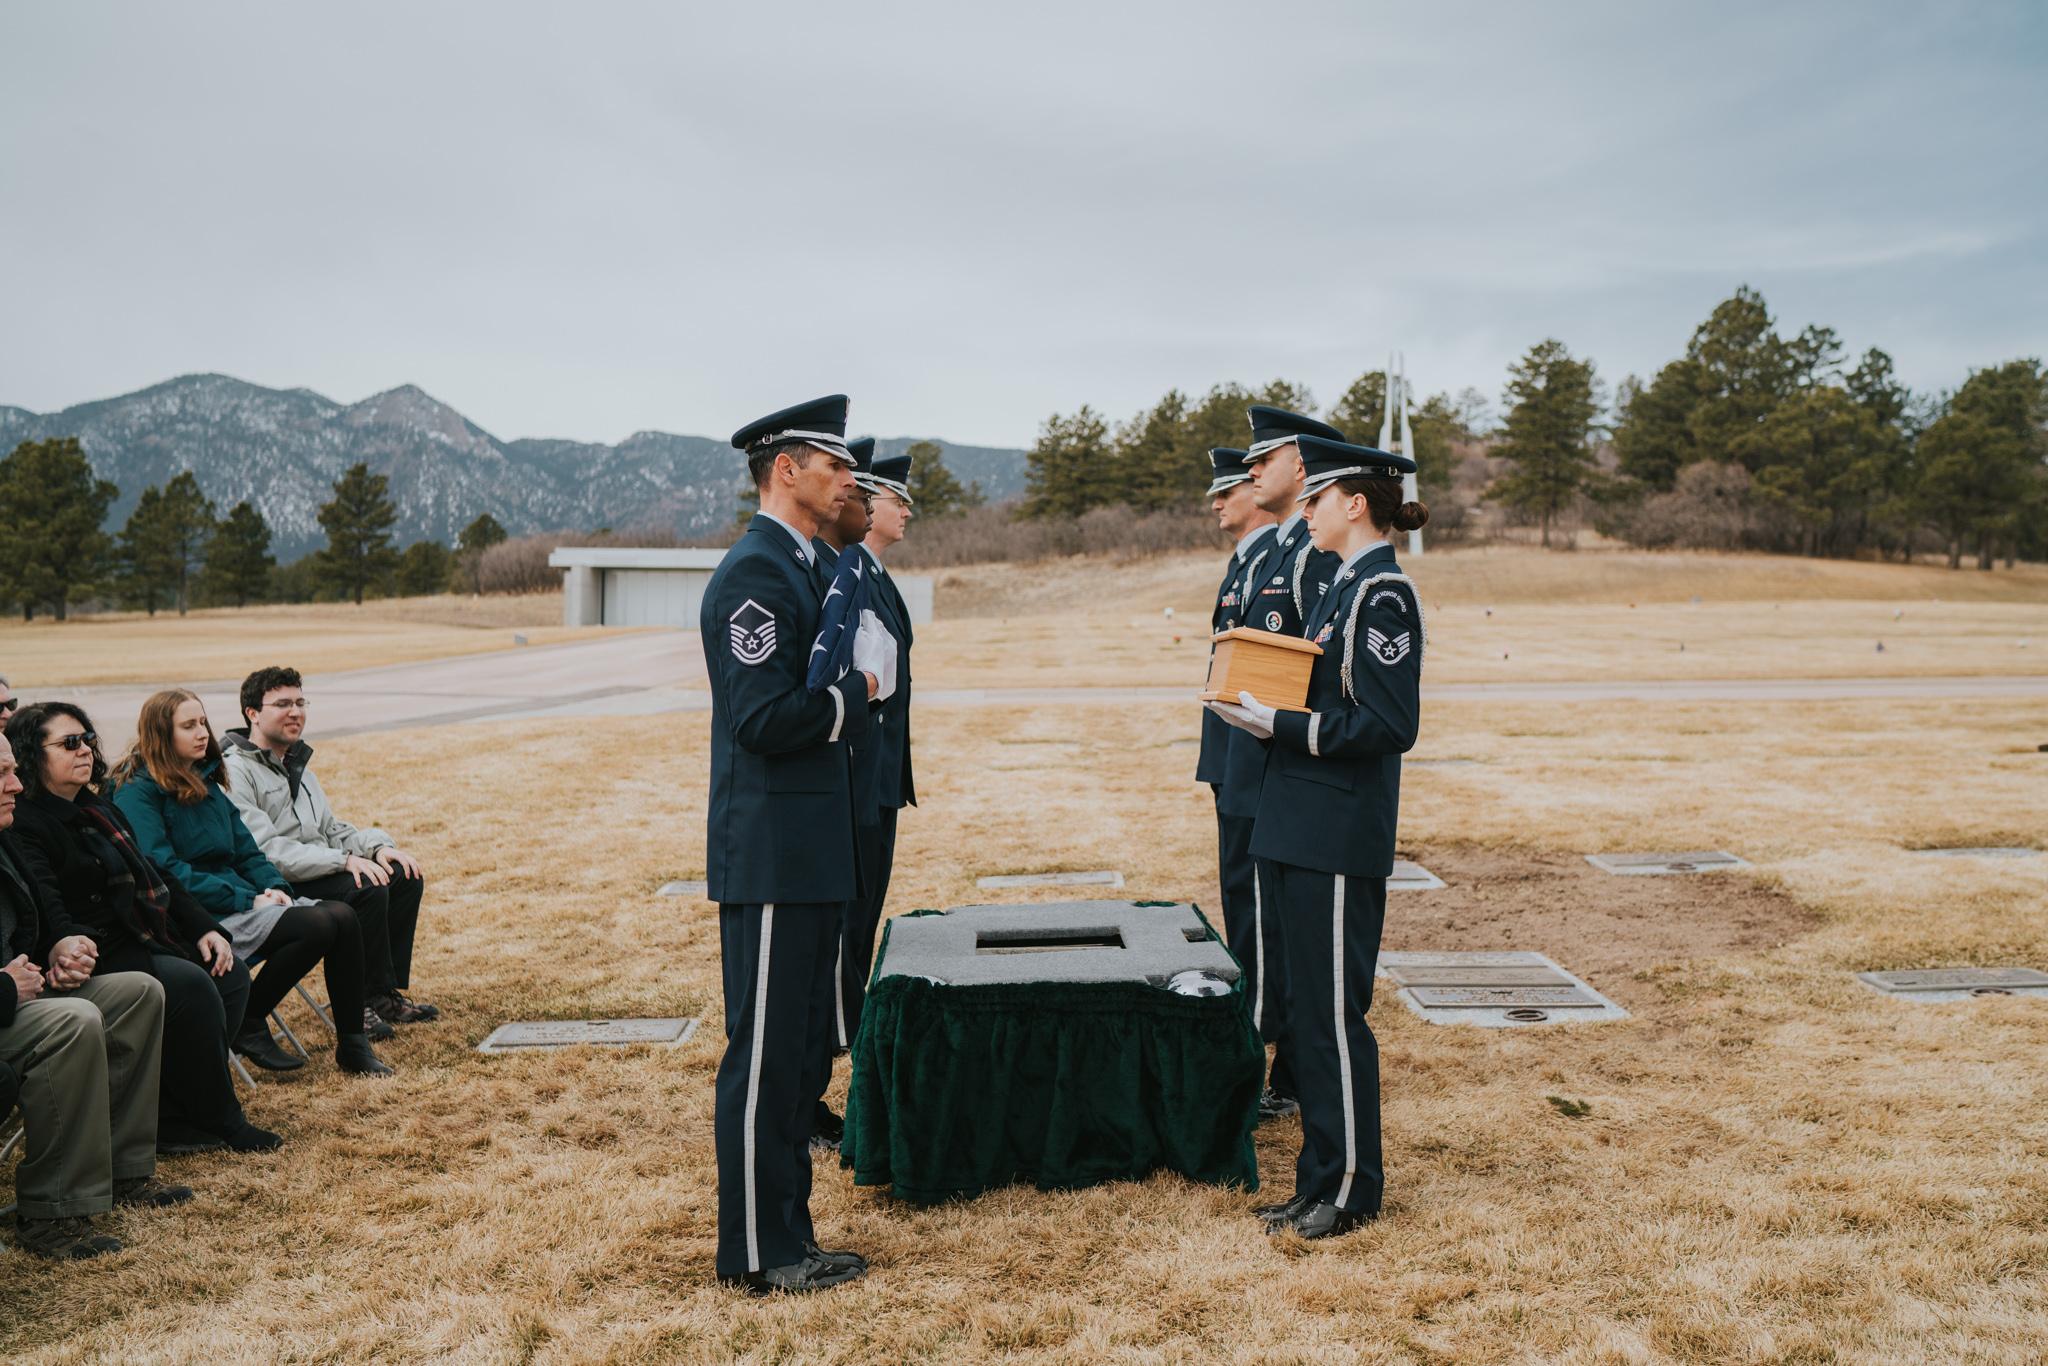 usafa-colorado-military-honours-burial-funeral-photography-grace-elizabeth-colchester-essex-alternative-wedding-lifestyle-photographer (28 of 127).jpg